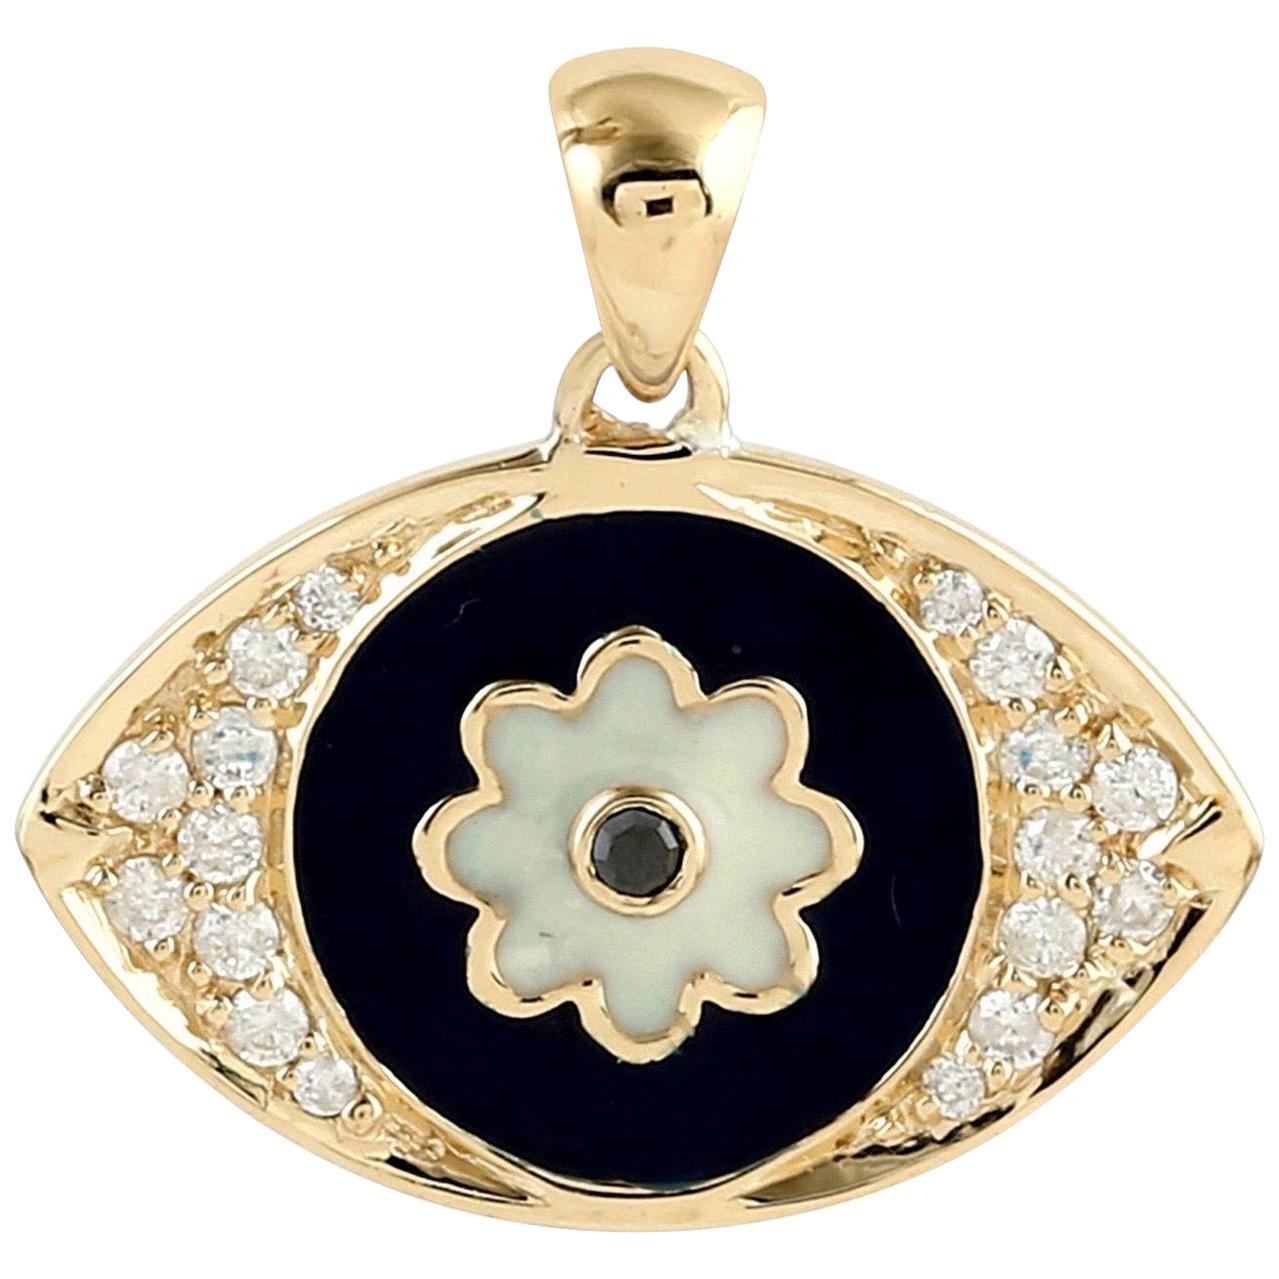 Enamel Evil Eye 18 Karat Gold Diamond Pendant Necklace